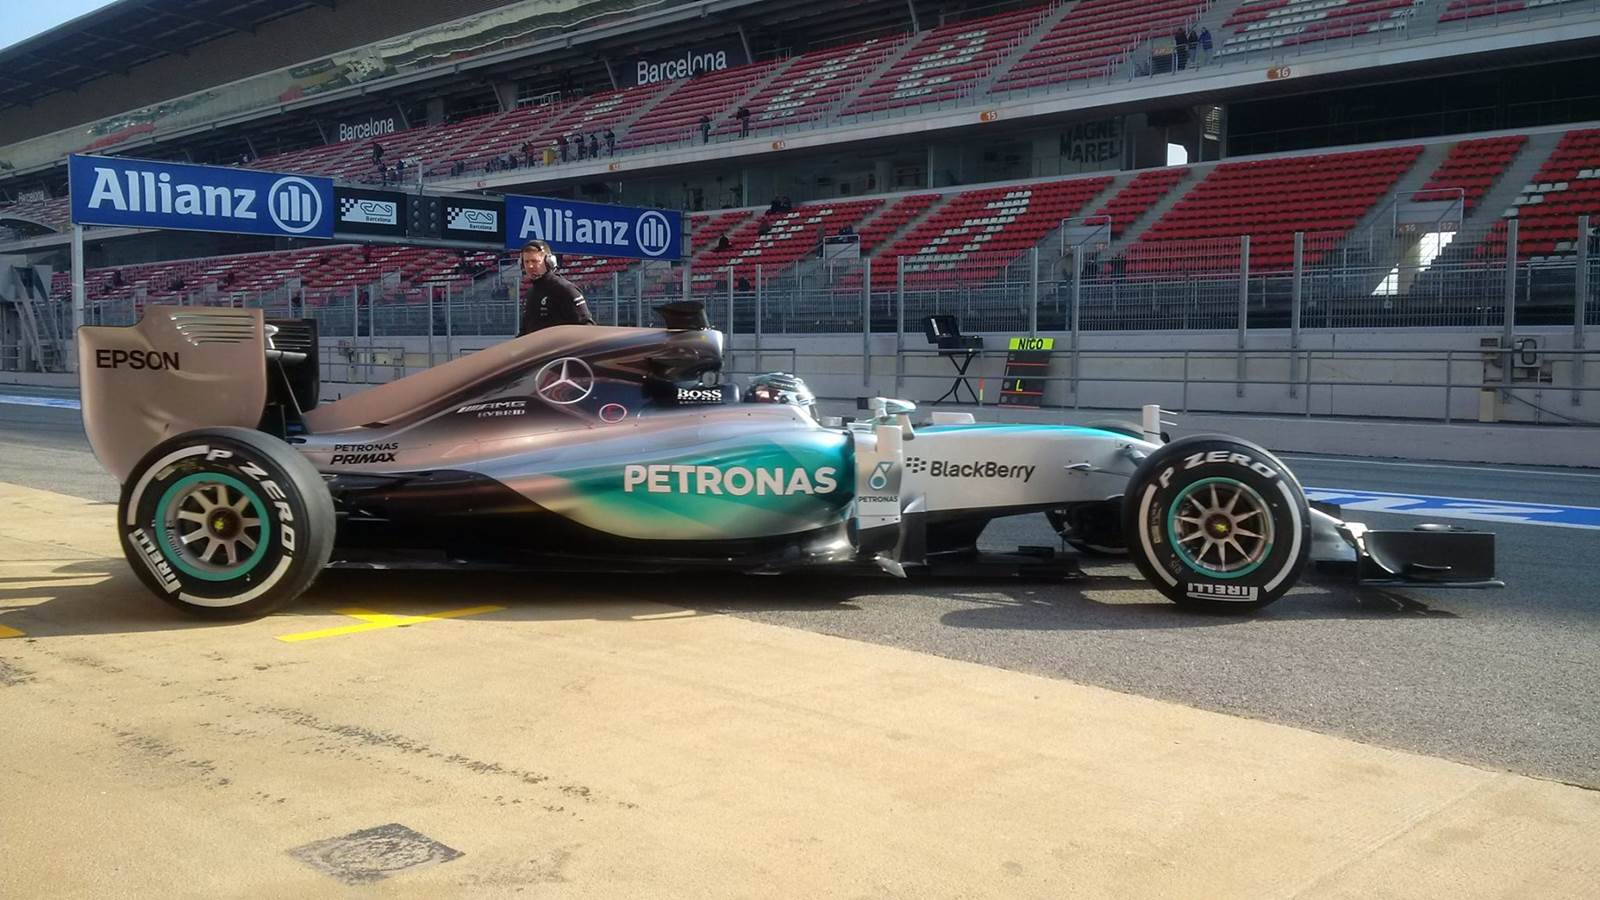 Mercedes W06 Hybrid - Nico Rosberg